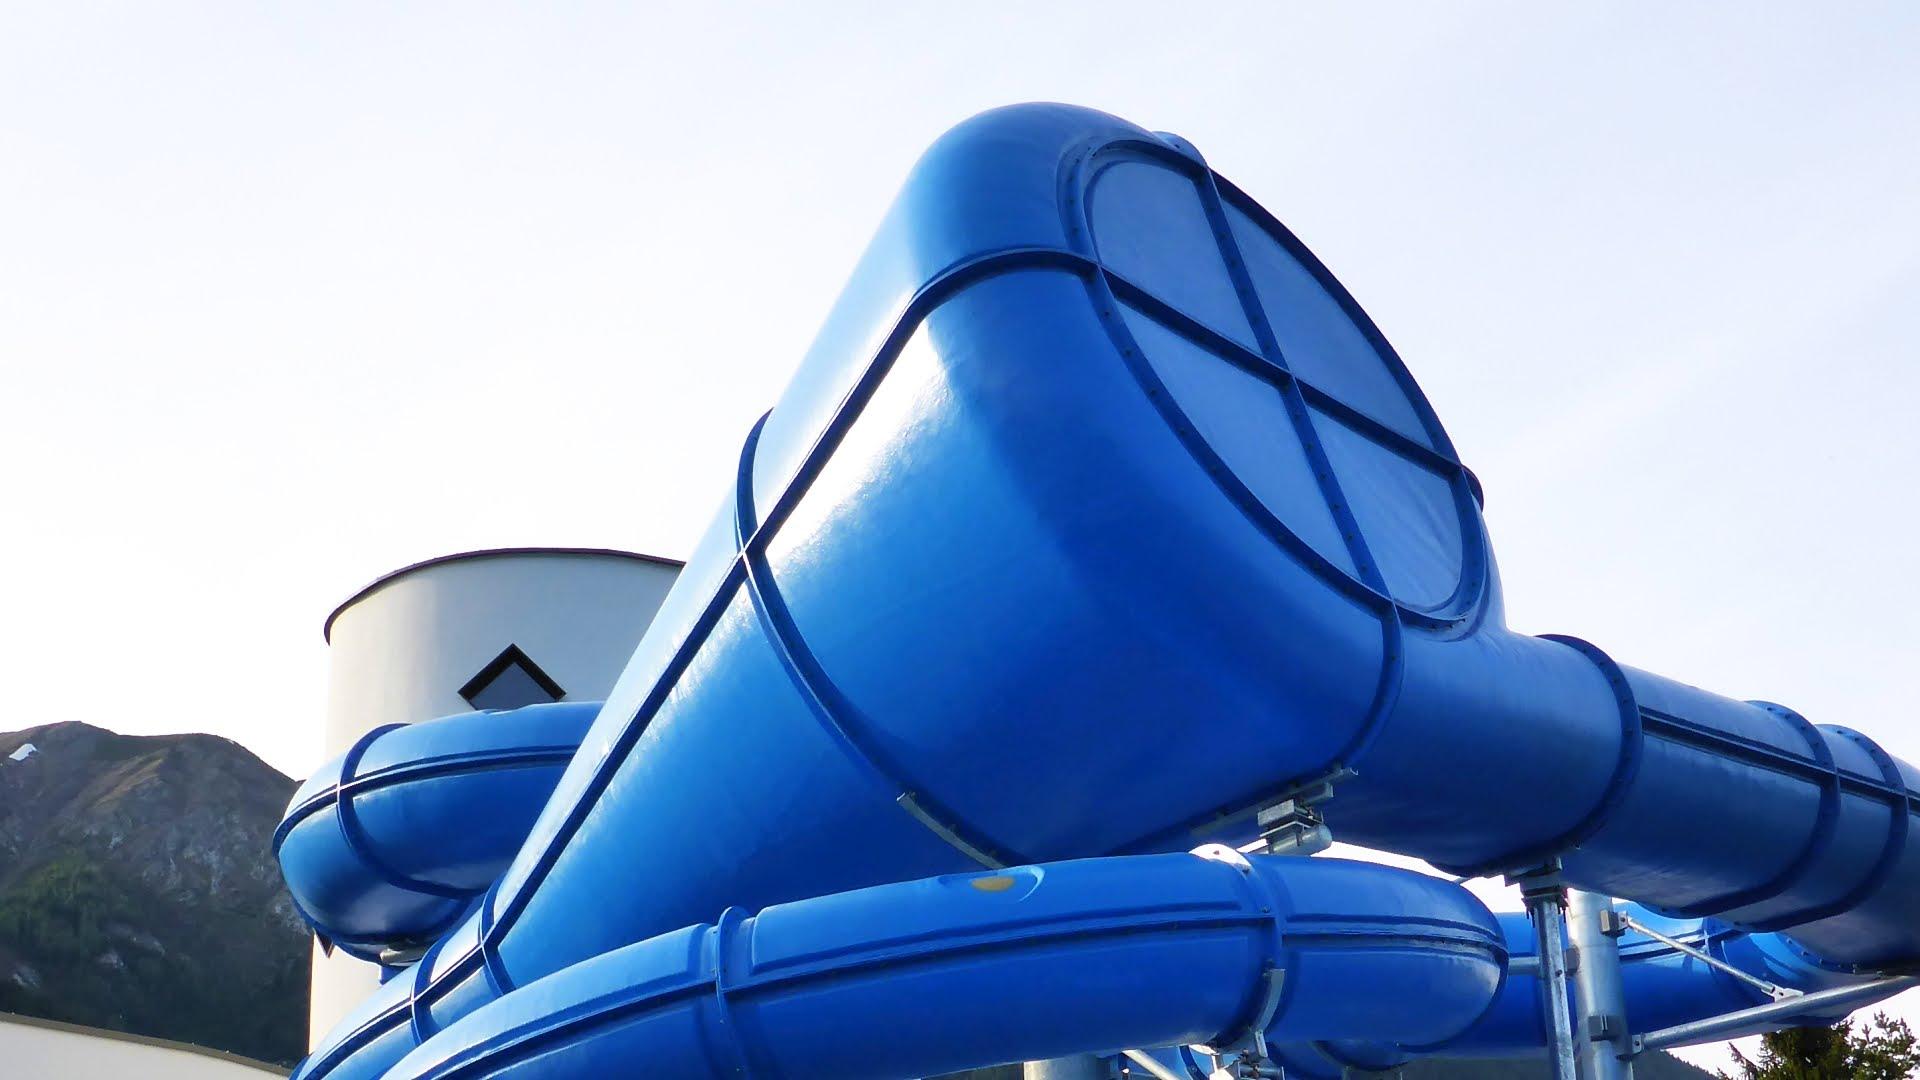 Cone Slide Reifenrutsche   StuBay Freizeitbad Telfes